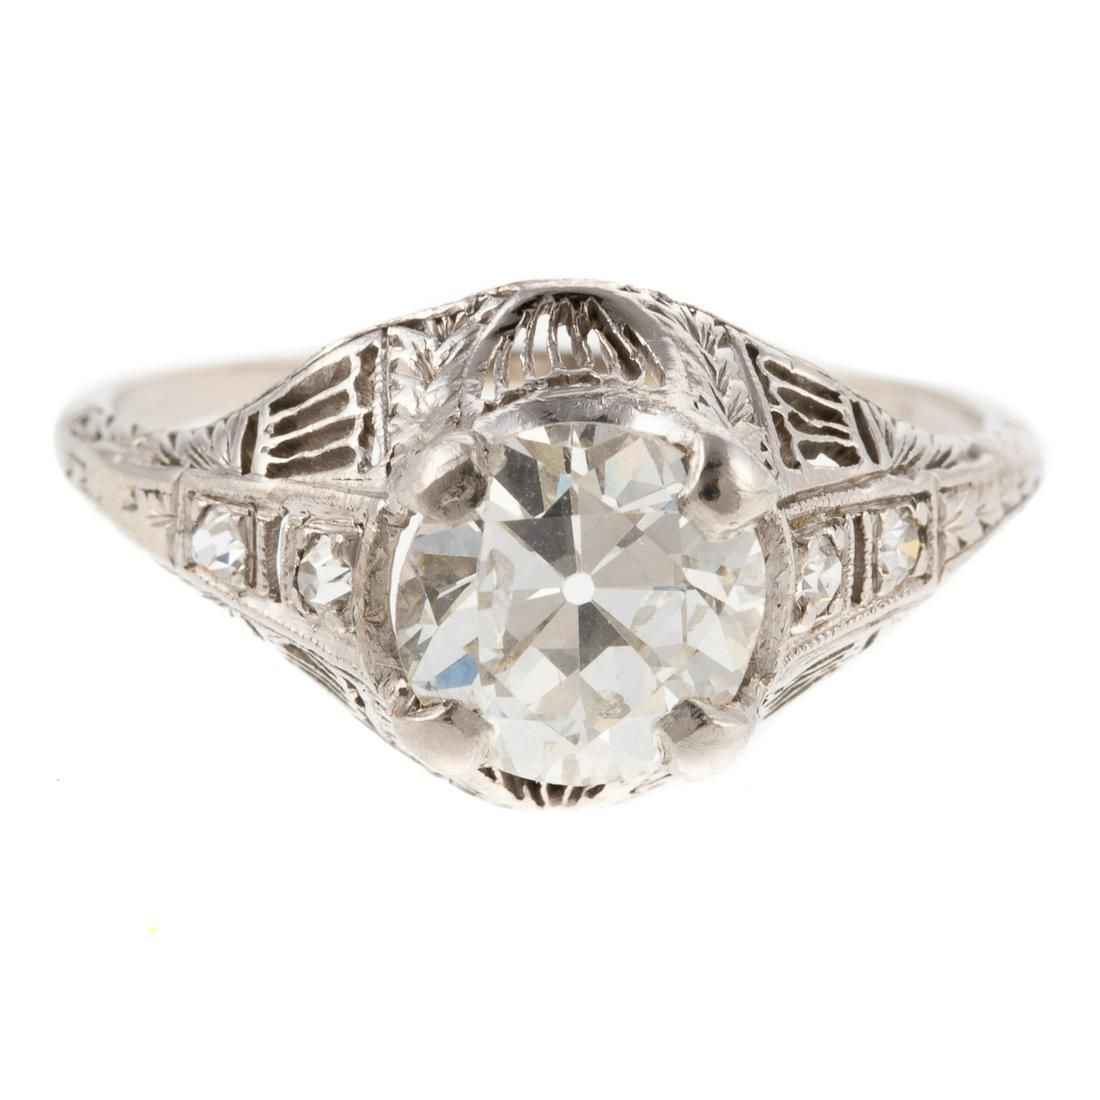 An Art Deco Filigree Diamond Ring in 14K